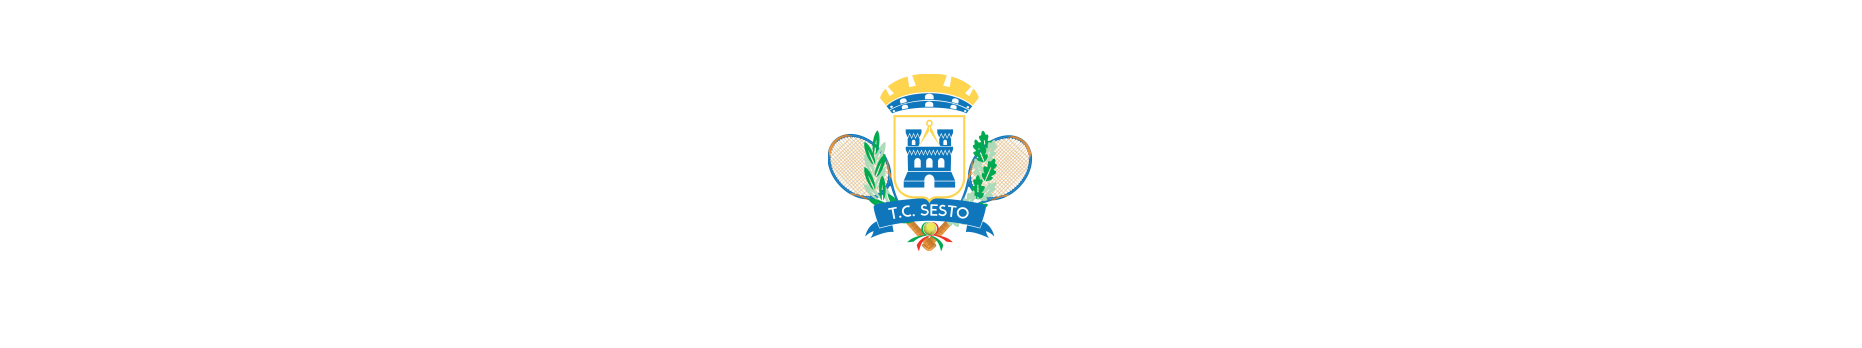 Associazione Tennis Club Sesto ASD - logo